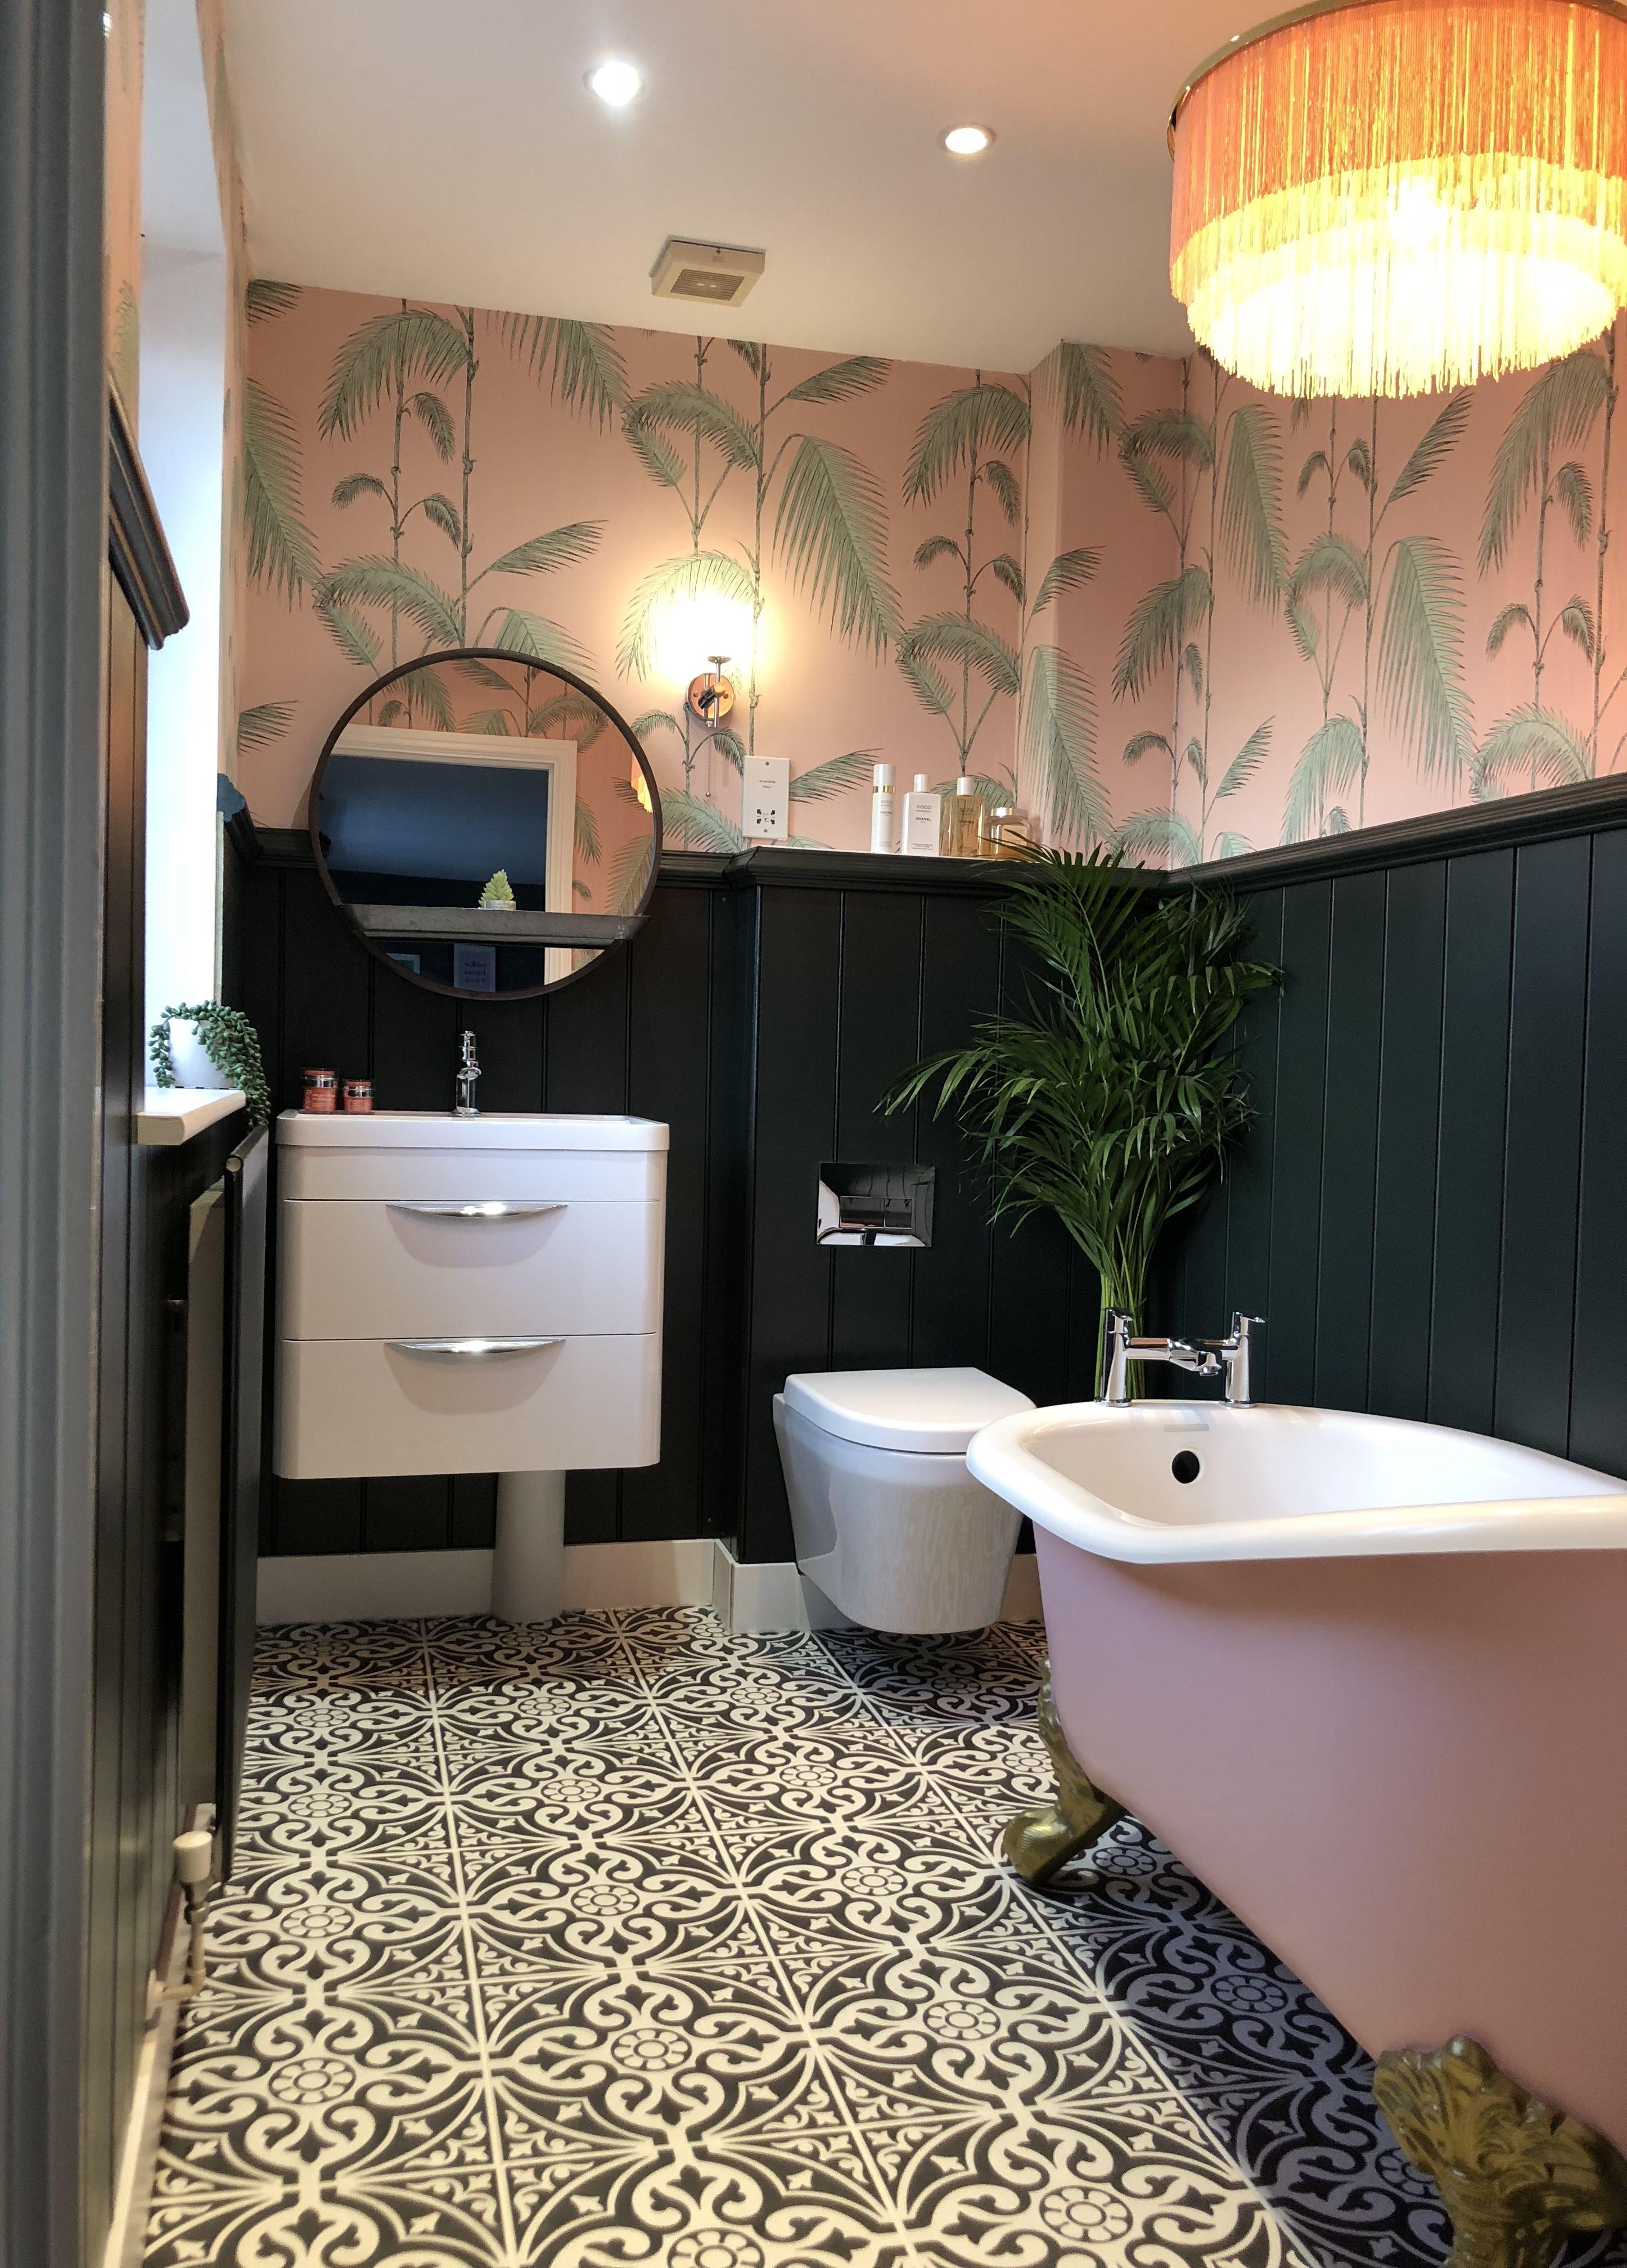 Jools Pink And Green Bathroom Of Dreams Green Bathroom Bathroom Interior Blue Green Bathrooms